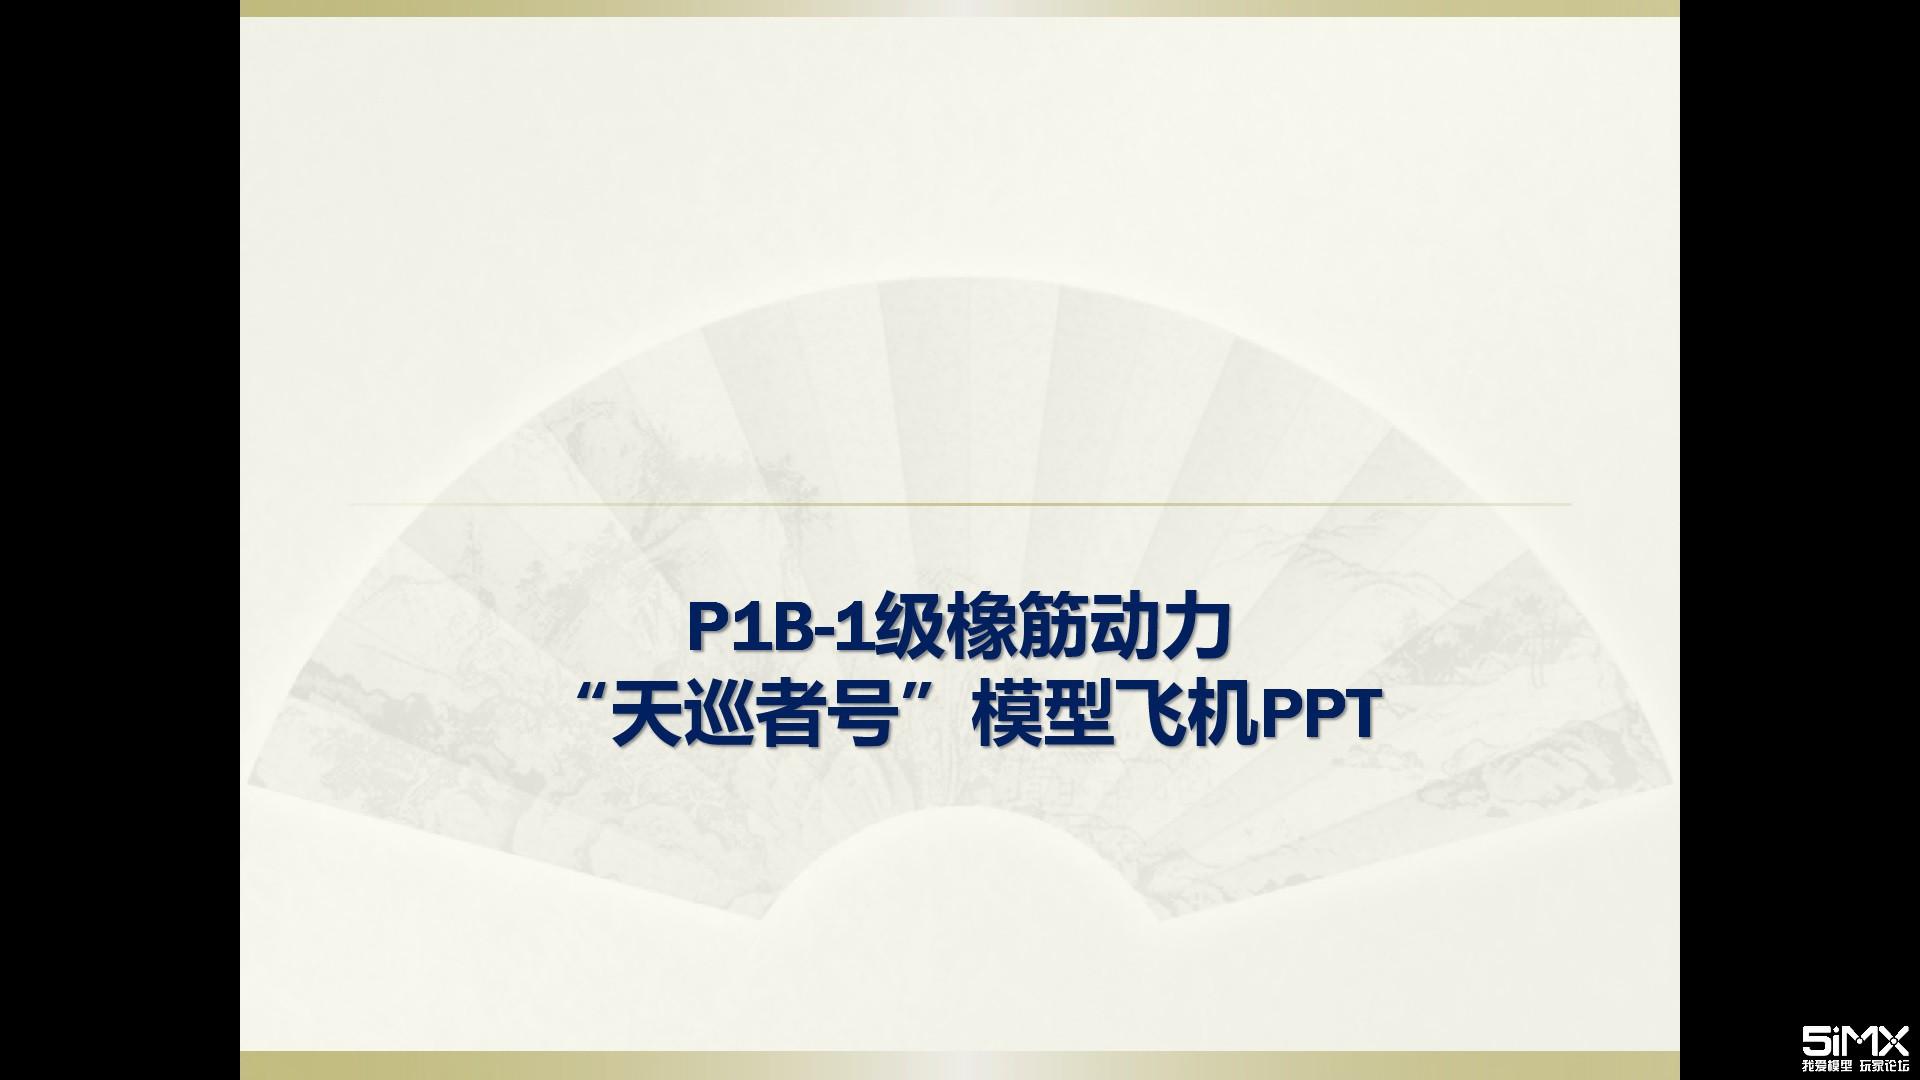 "P1B-1级橡筋动力""天巡者号""模型飞机PPTv2.0,更新增加了视频"